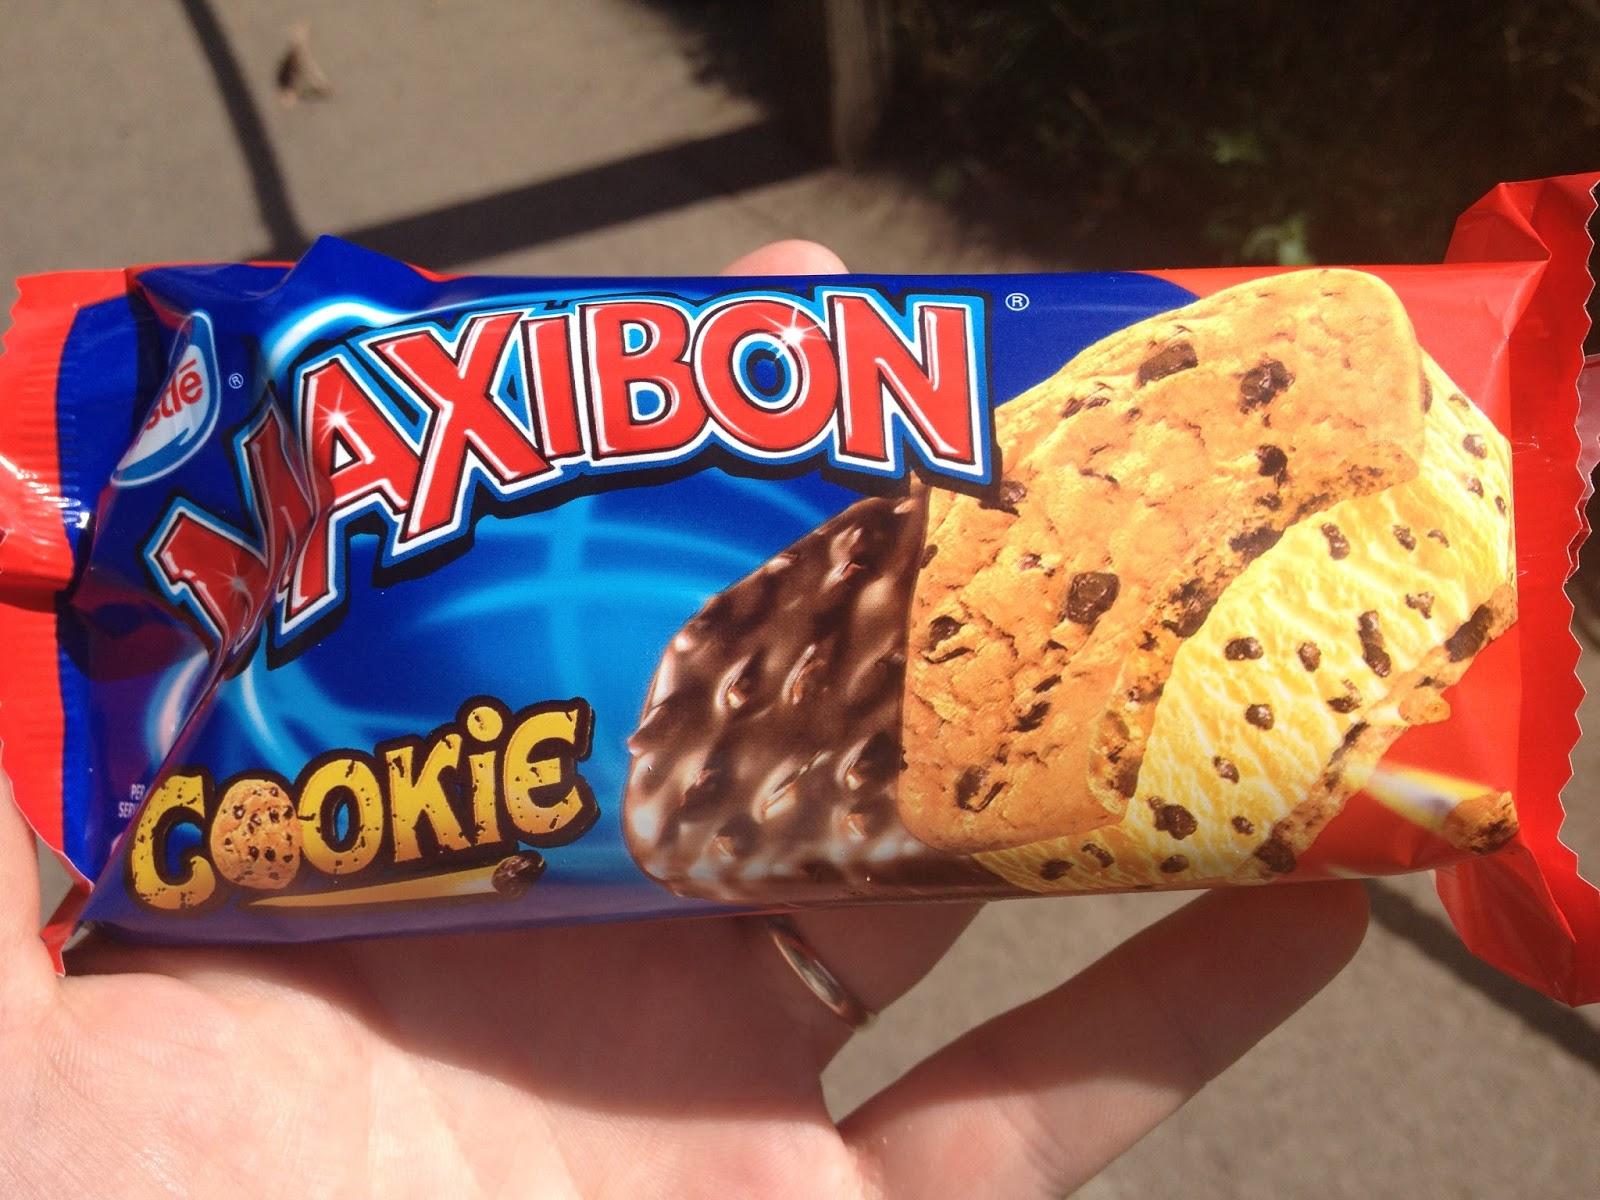 Maxibons